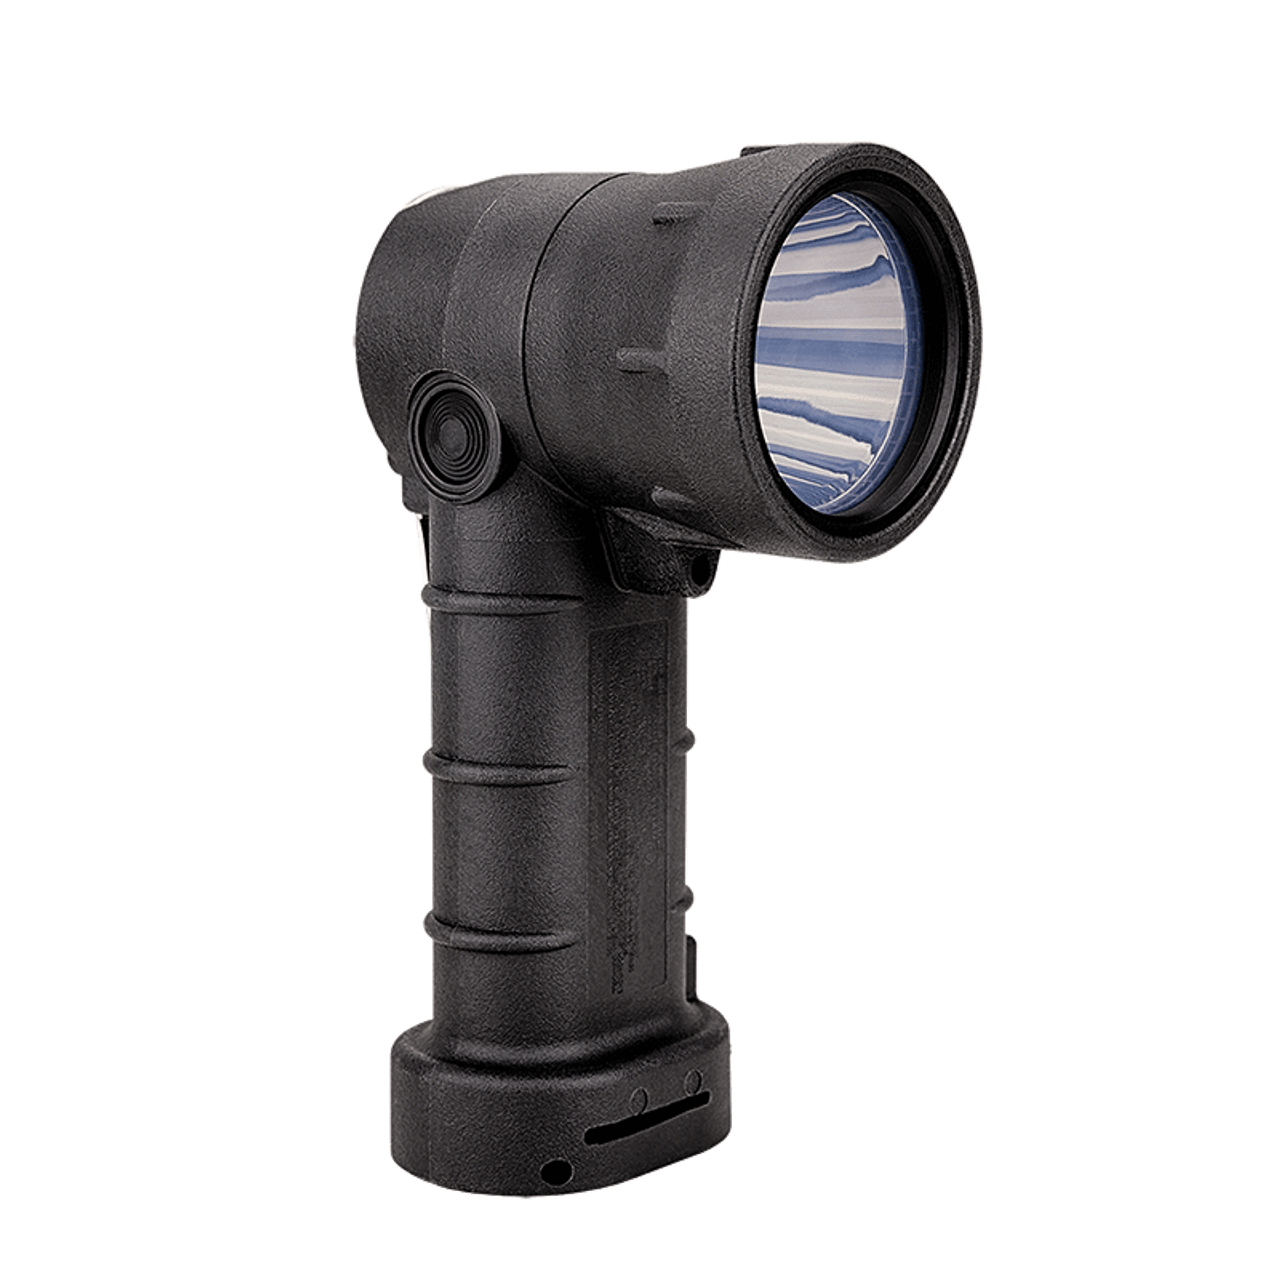 Foxfury bts-is intrinsically safe right angle light